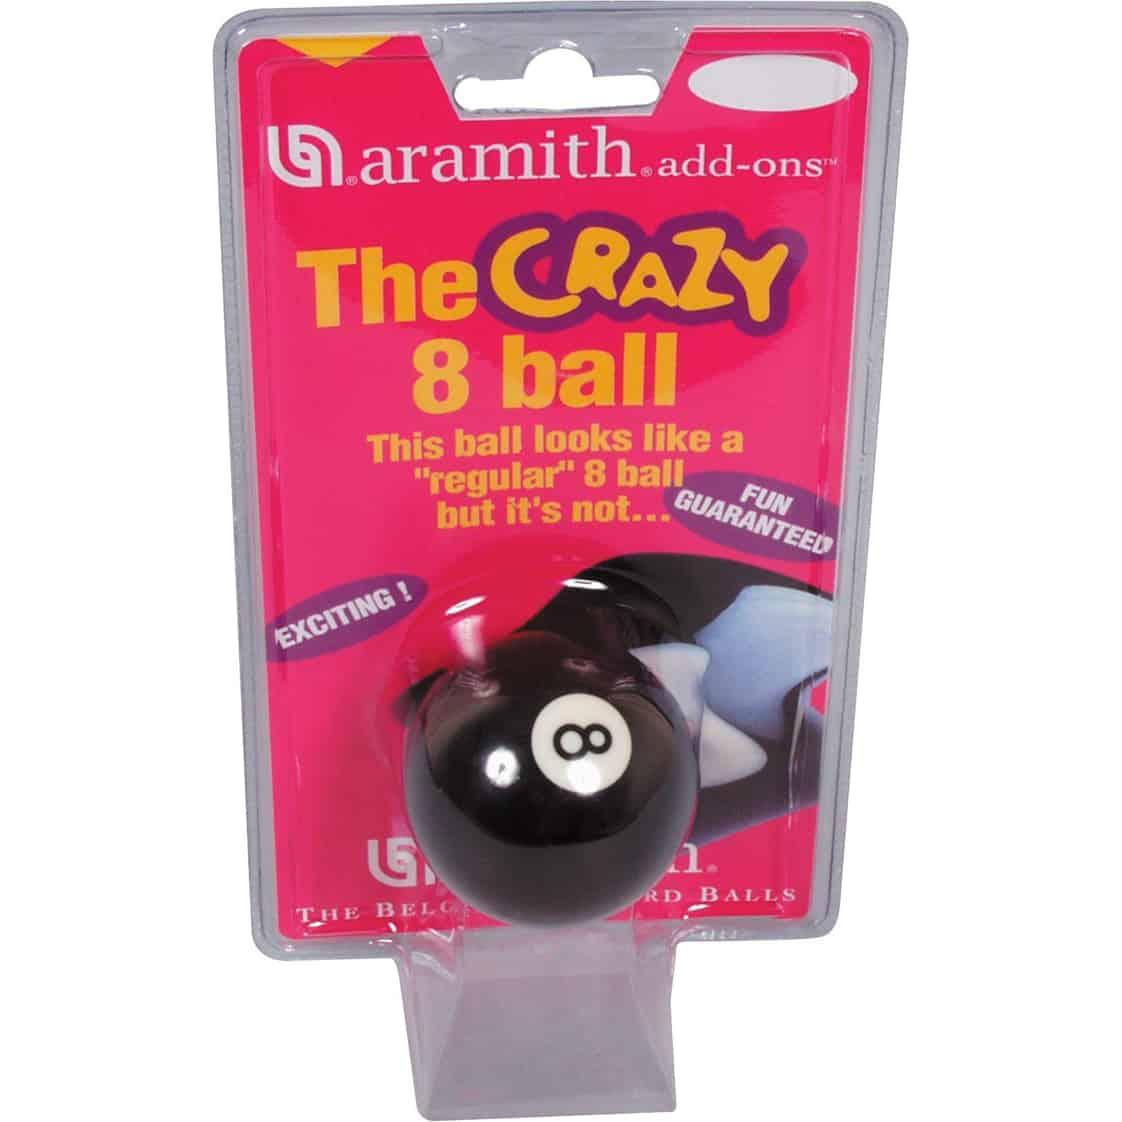 Aramith Crazy 8 Ball